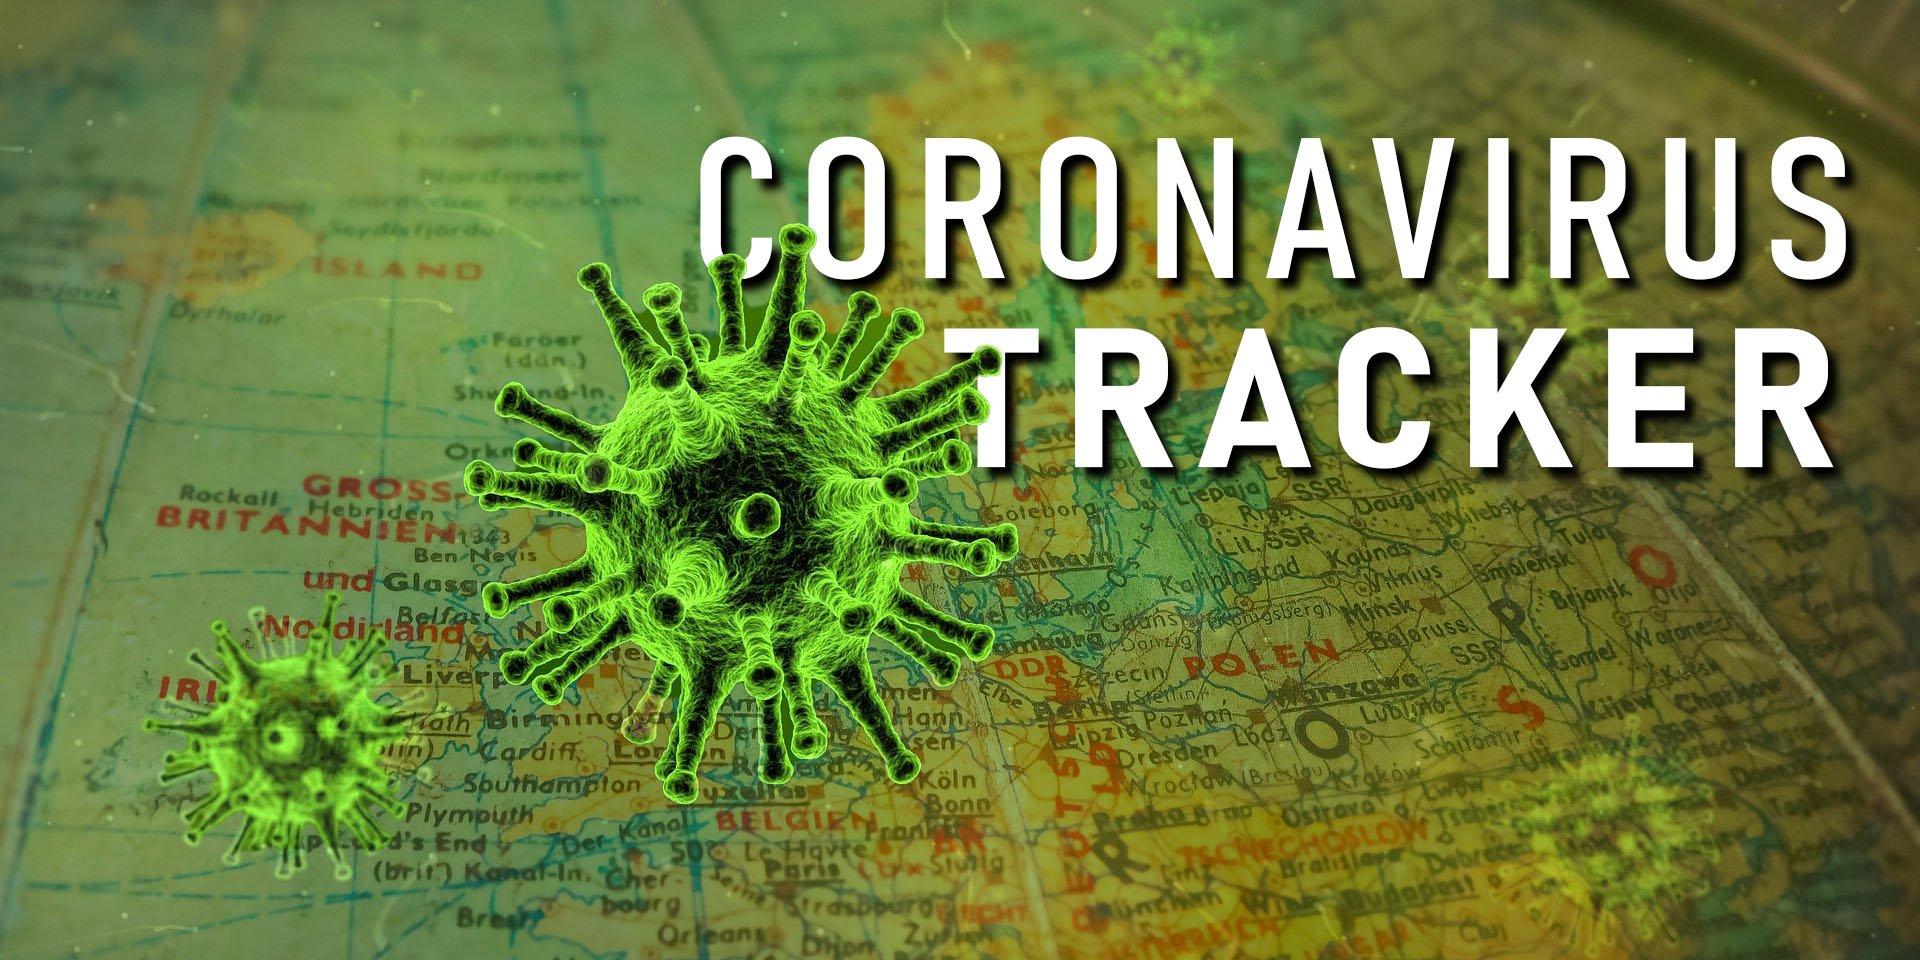 COVID-19 Coronavirus Tracker